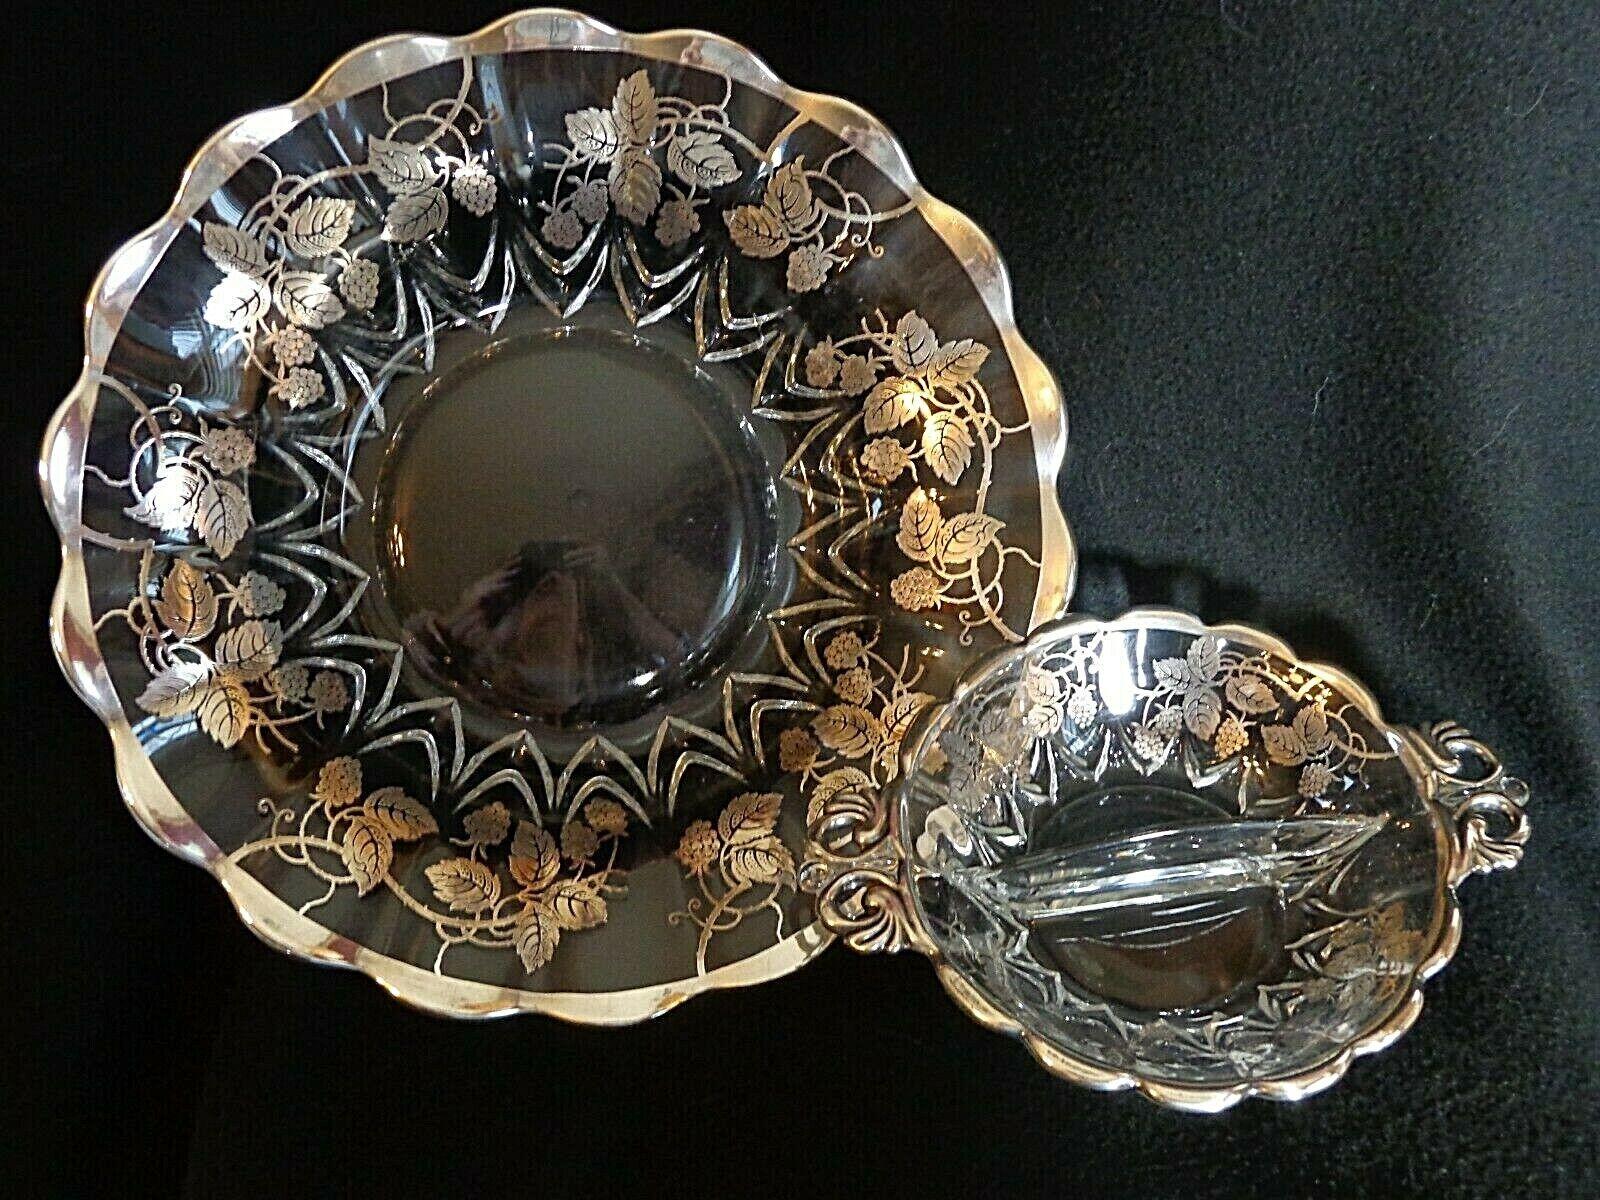 2 New Martinsville Janice Elegant Glass Silver Overlay Bowls - $20.00